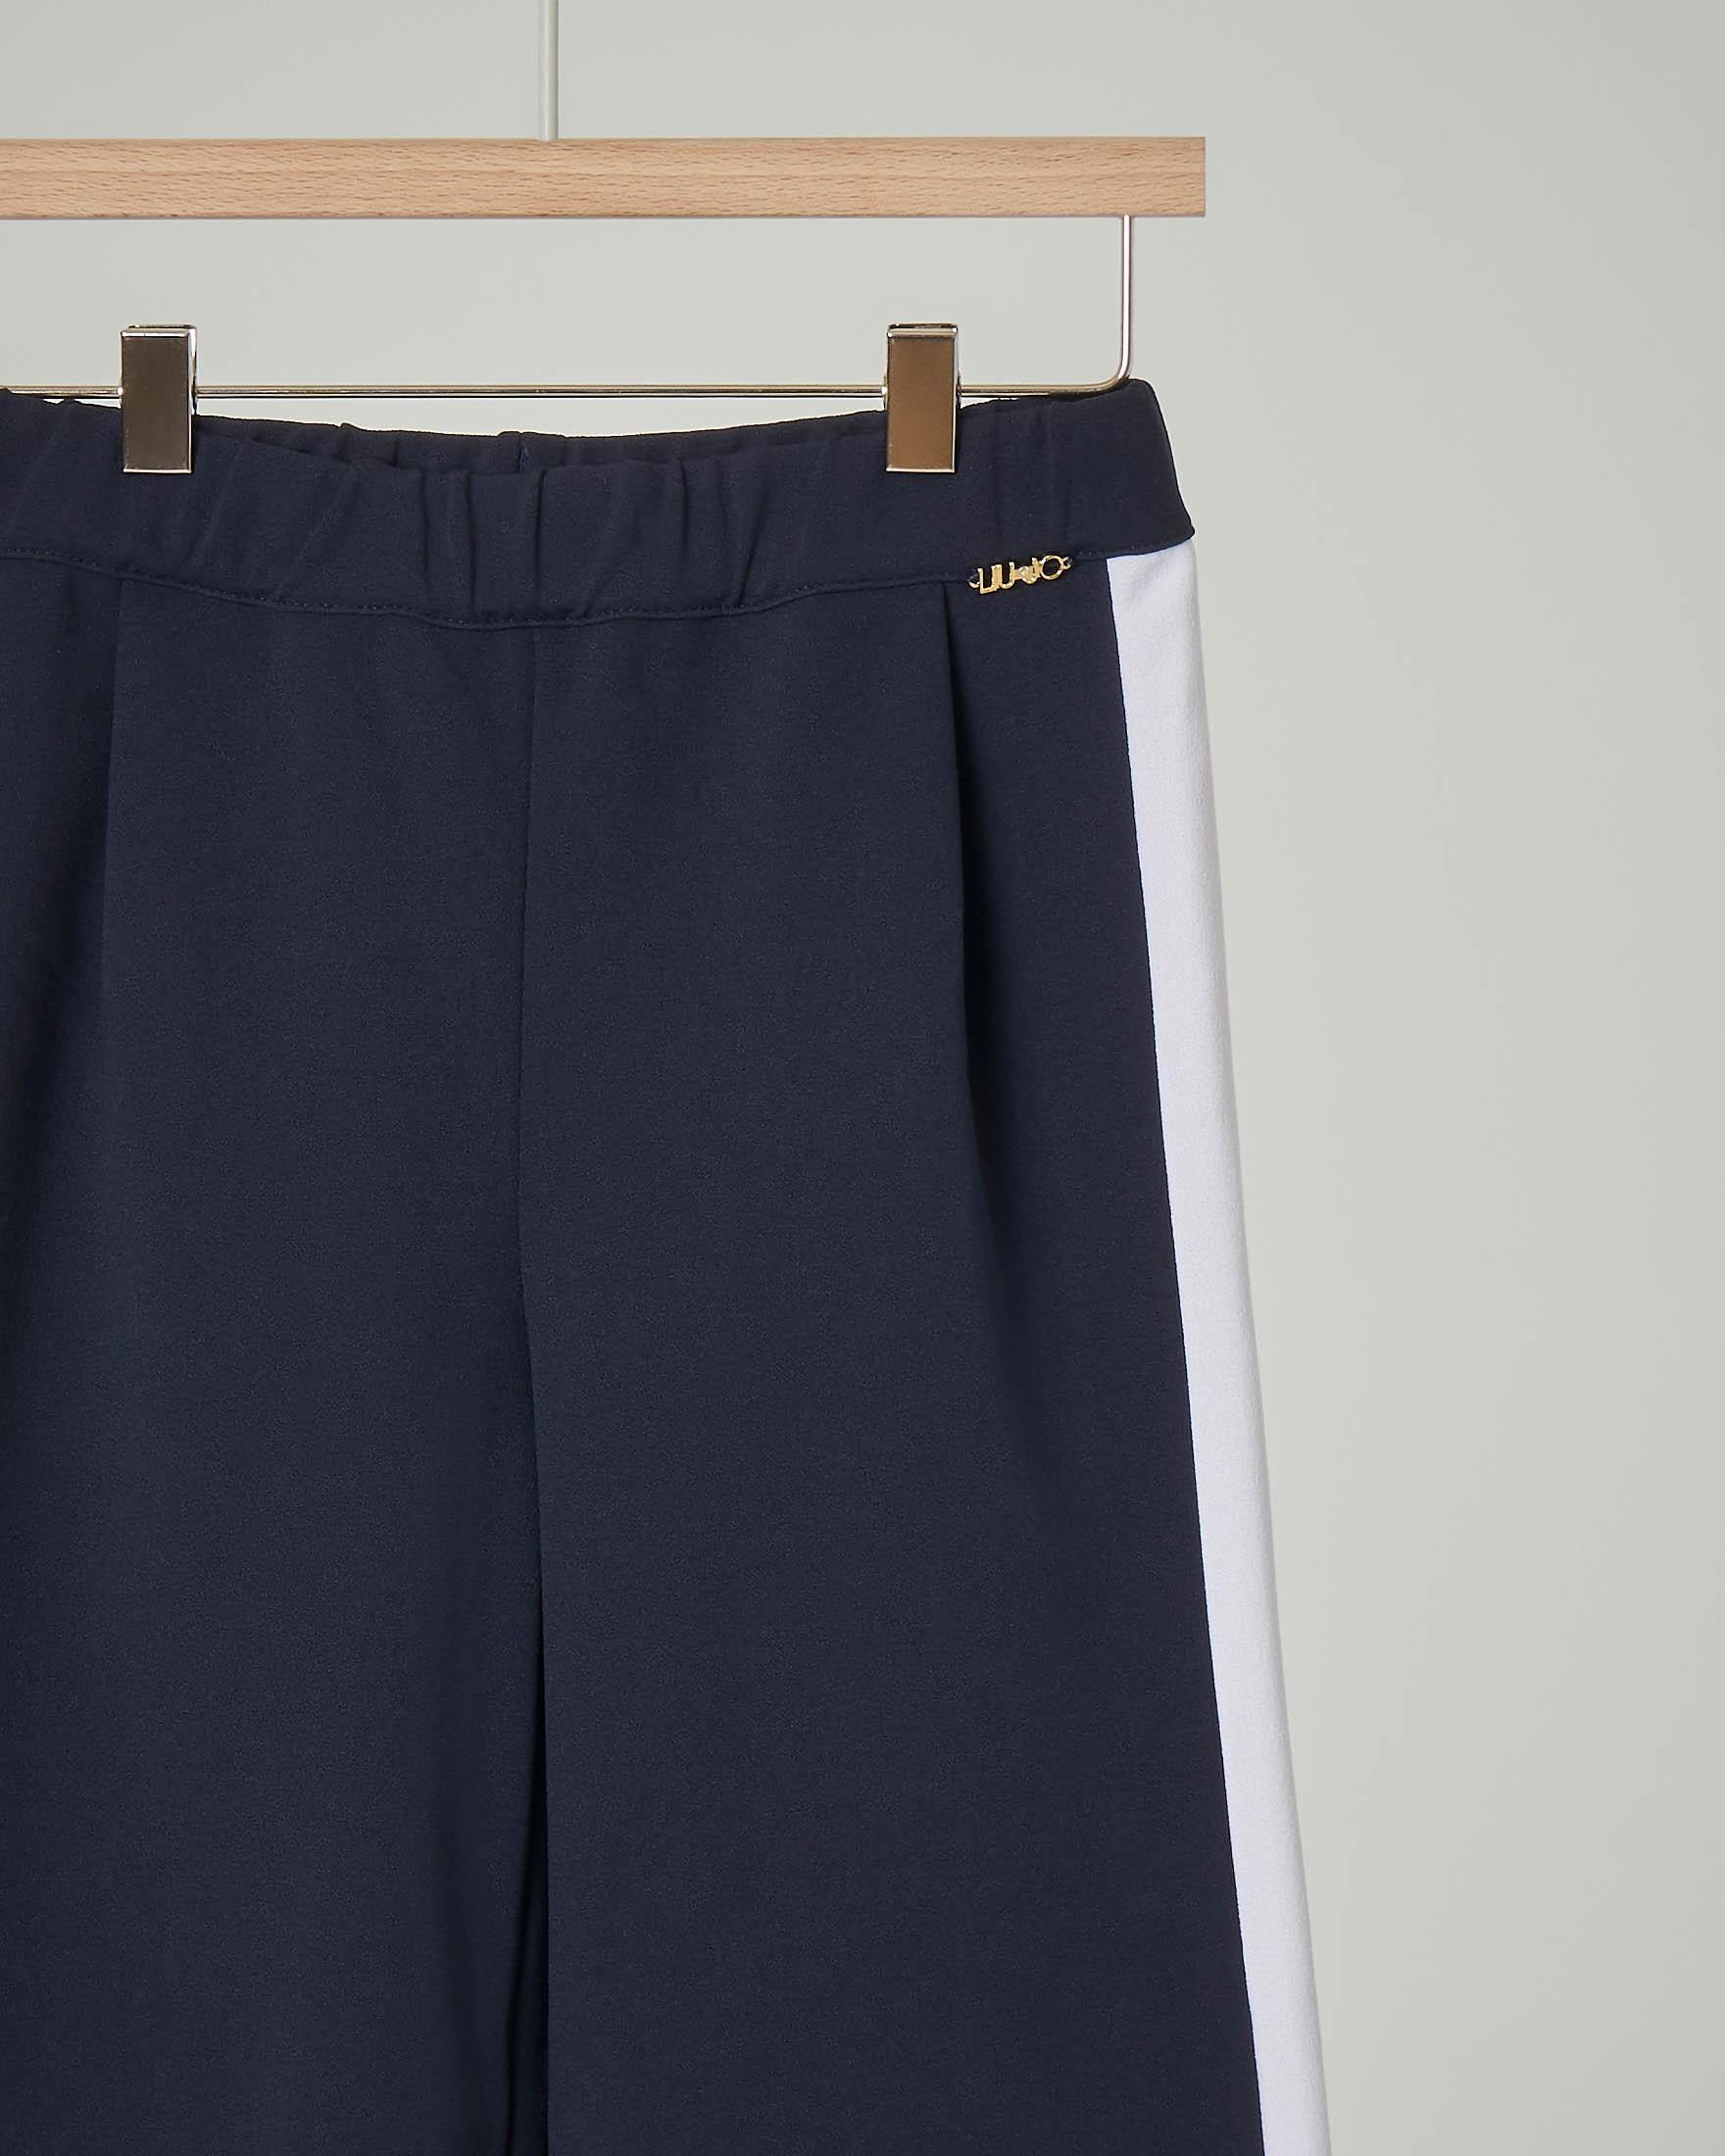 Pantalone blu cropped con banda